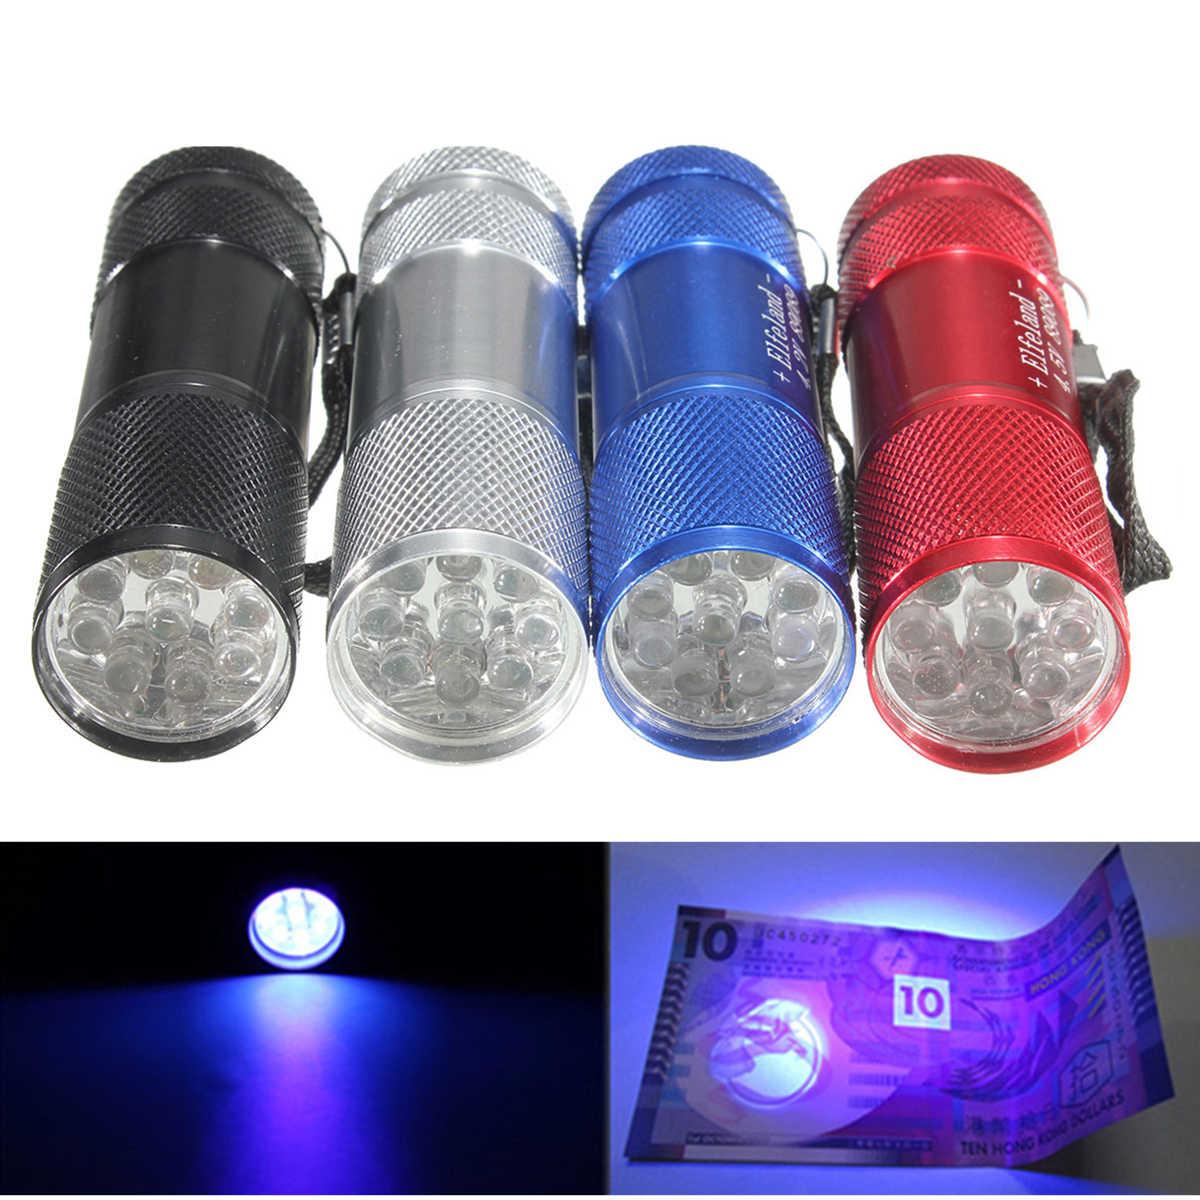 aaa For Ultraviolet Marker Blacklight Uv 395nm Torch Lamp 3 Use Light Detection 9 Elfeland Led Flashlight TJlK1cF3